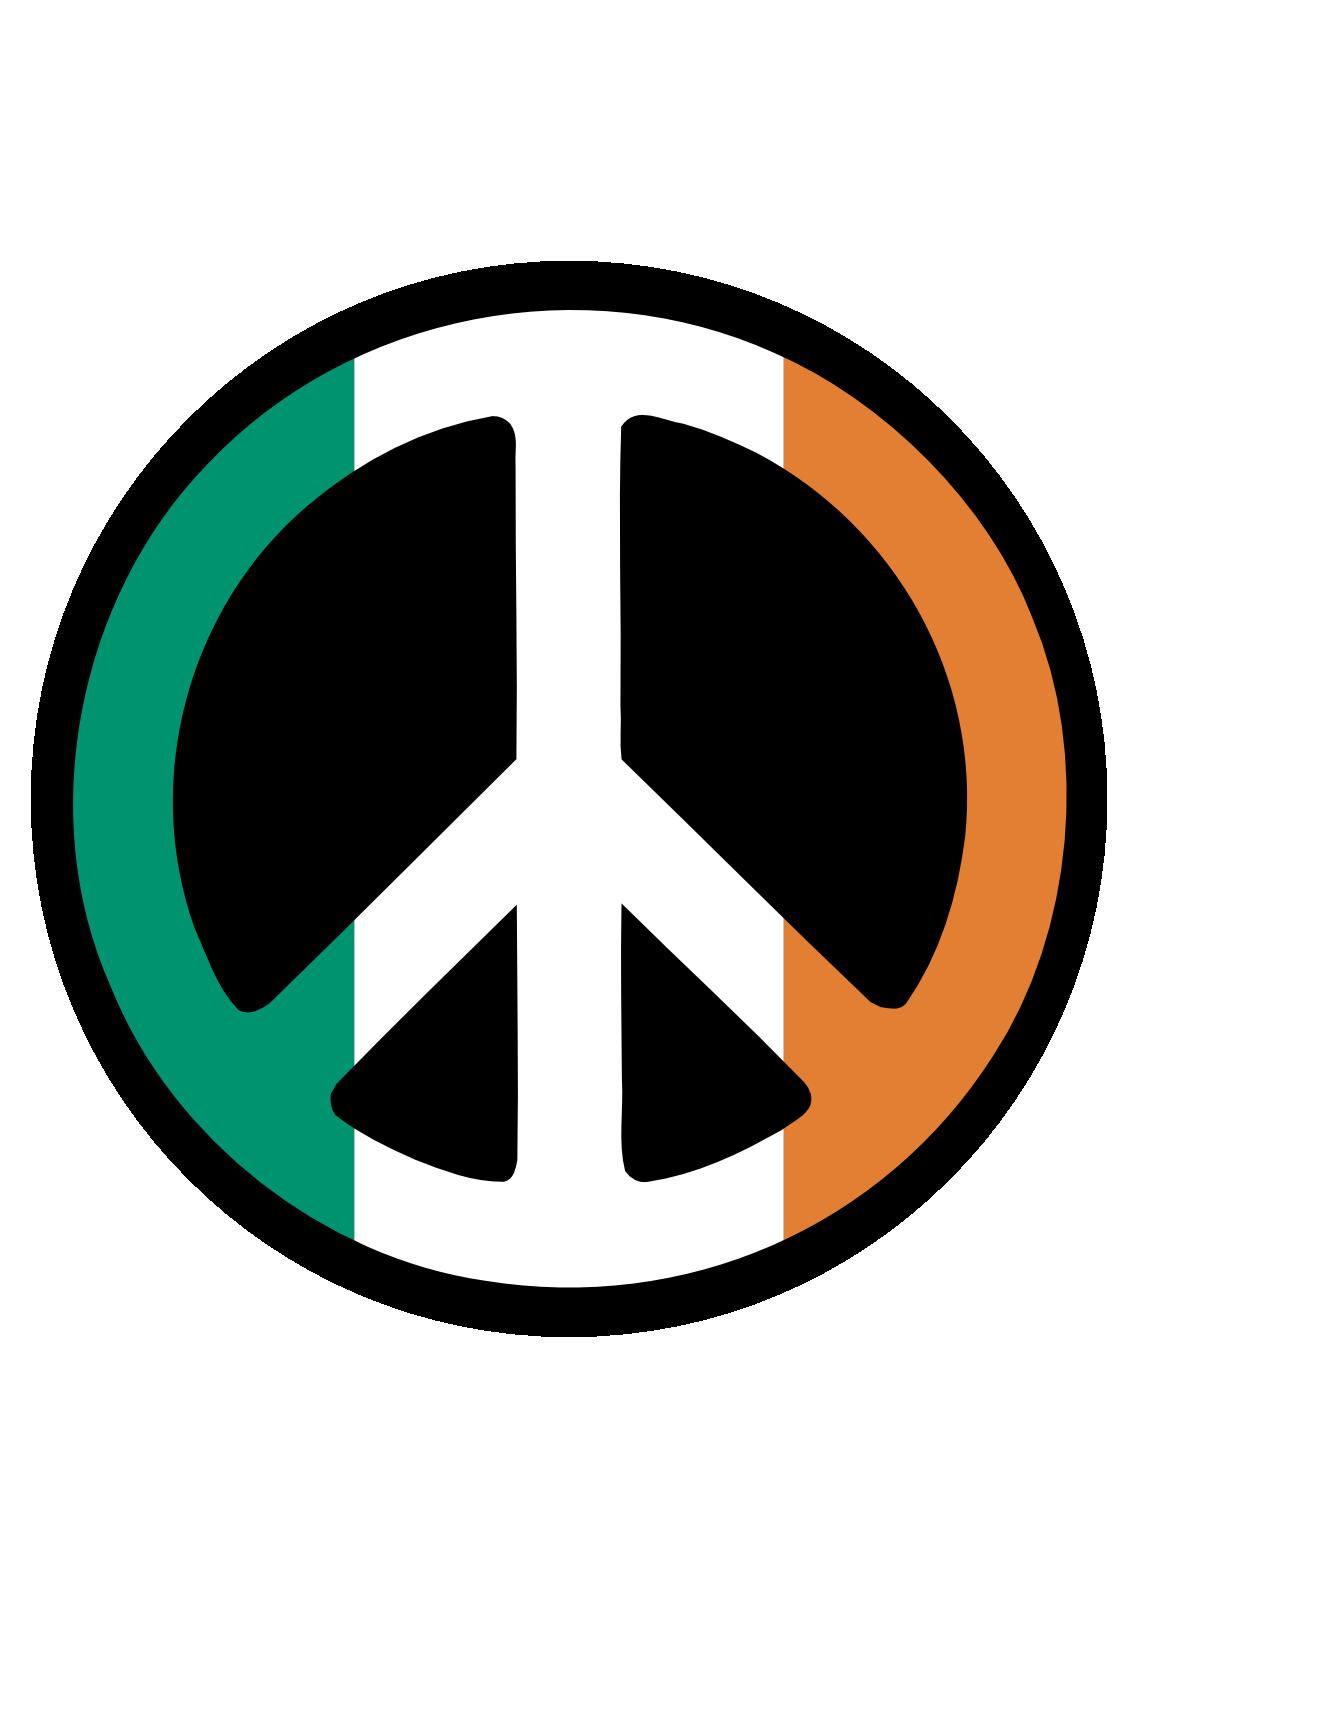 Symbol clipart irish Clip Irish Flag Clip library